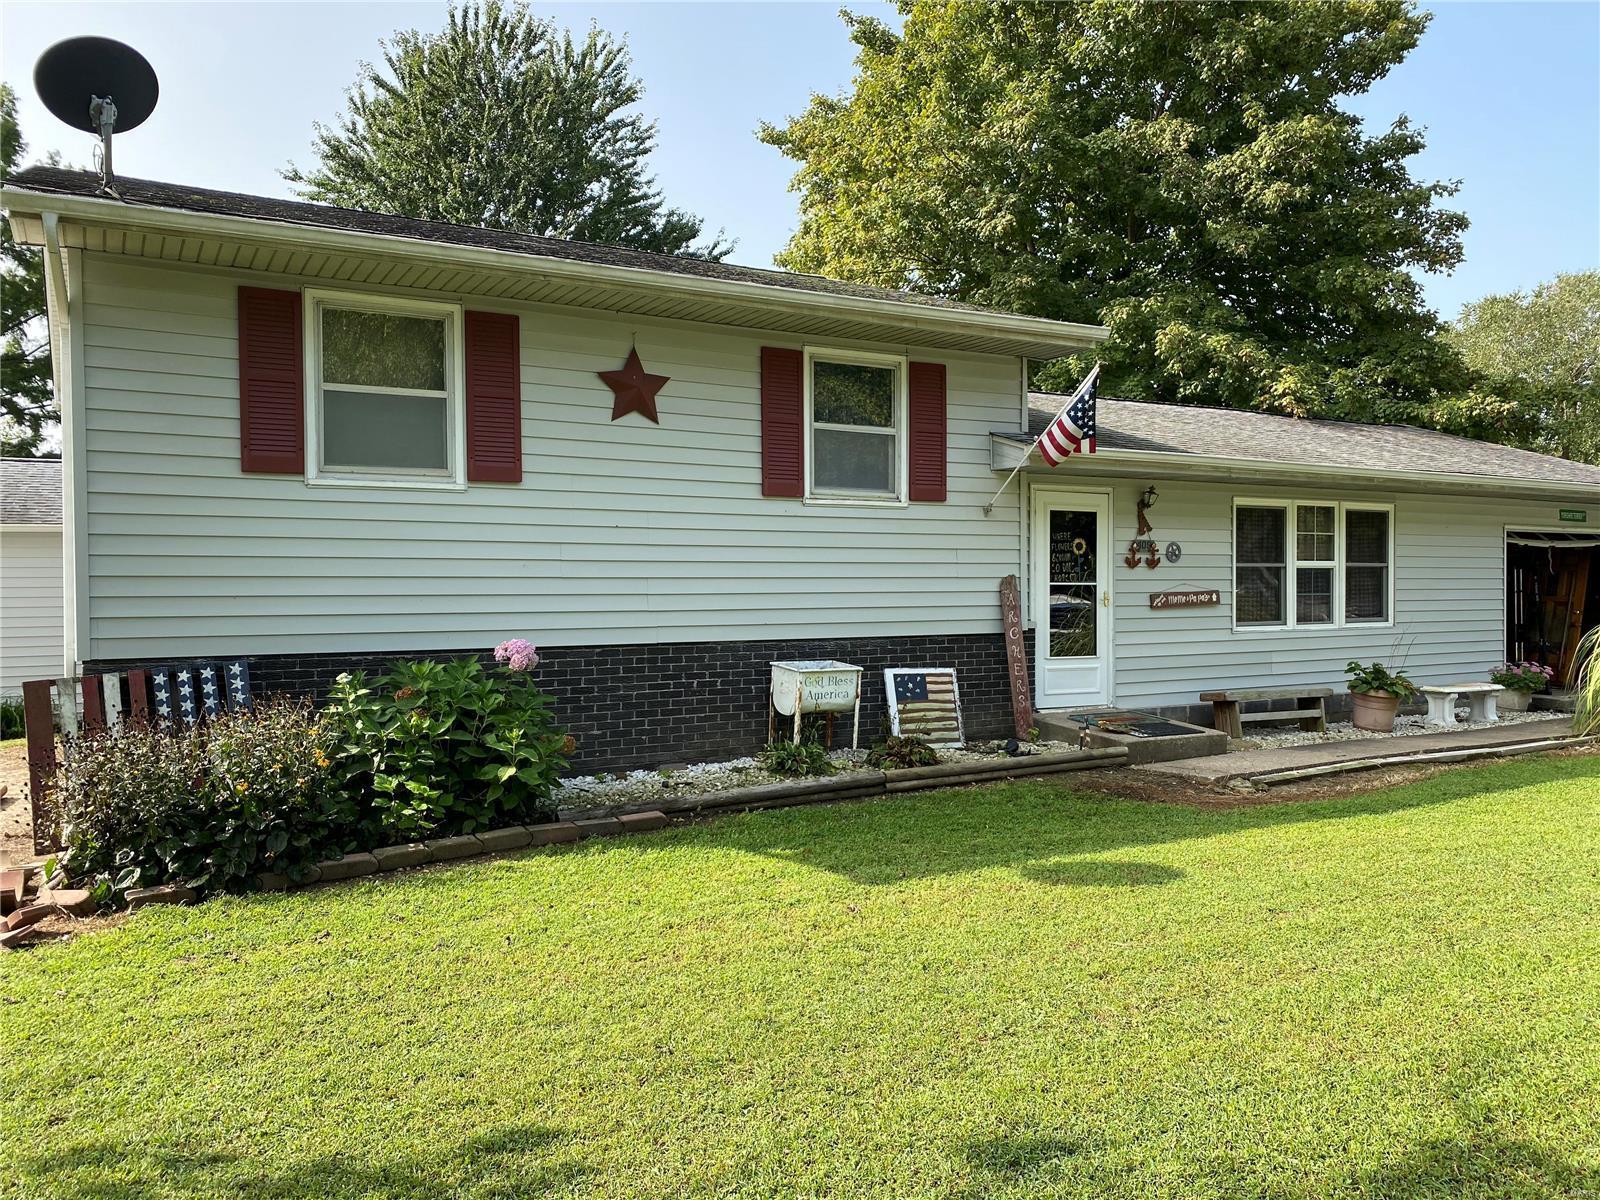 409 Camelot Property Photo - De Soto, IL real estate listing